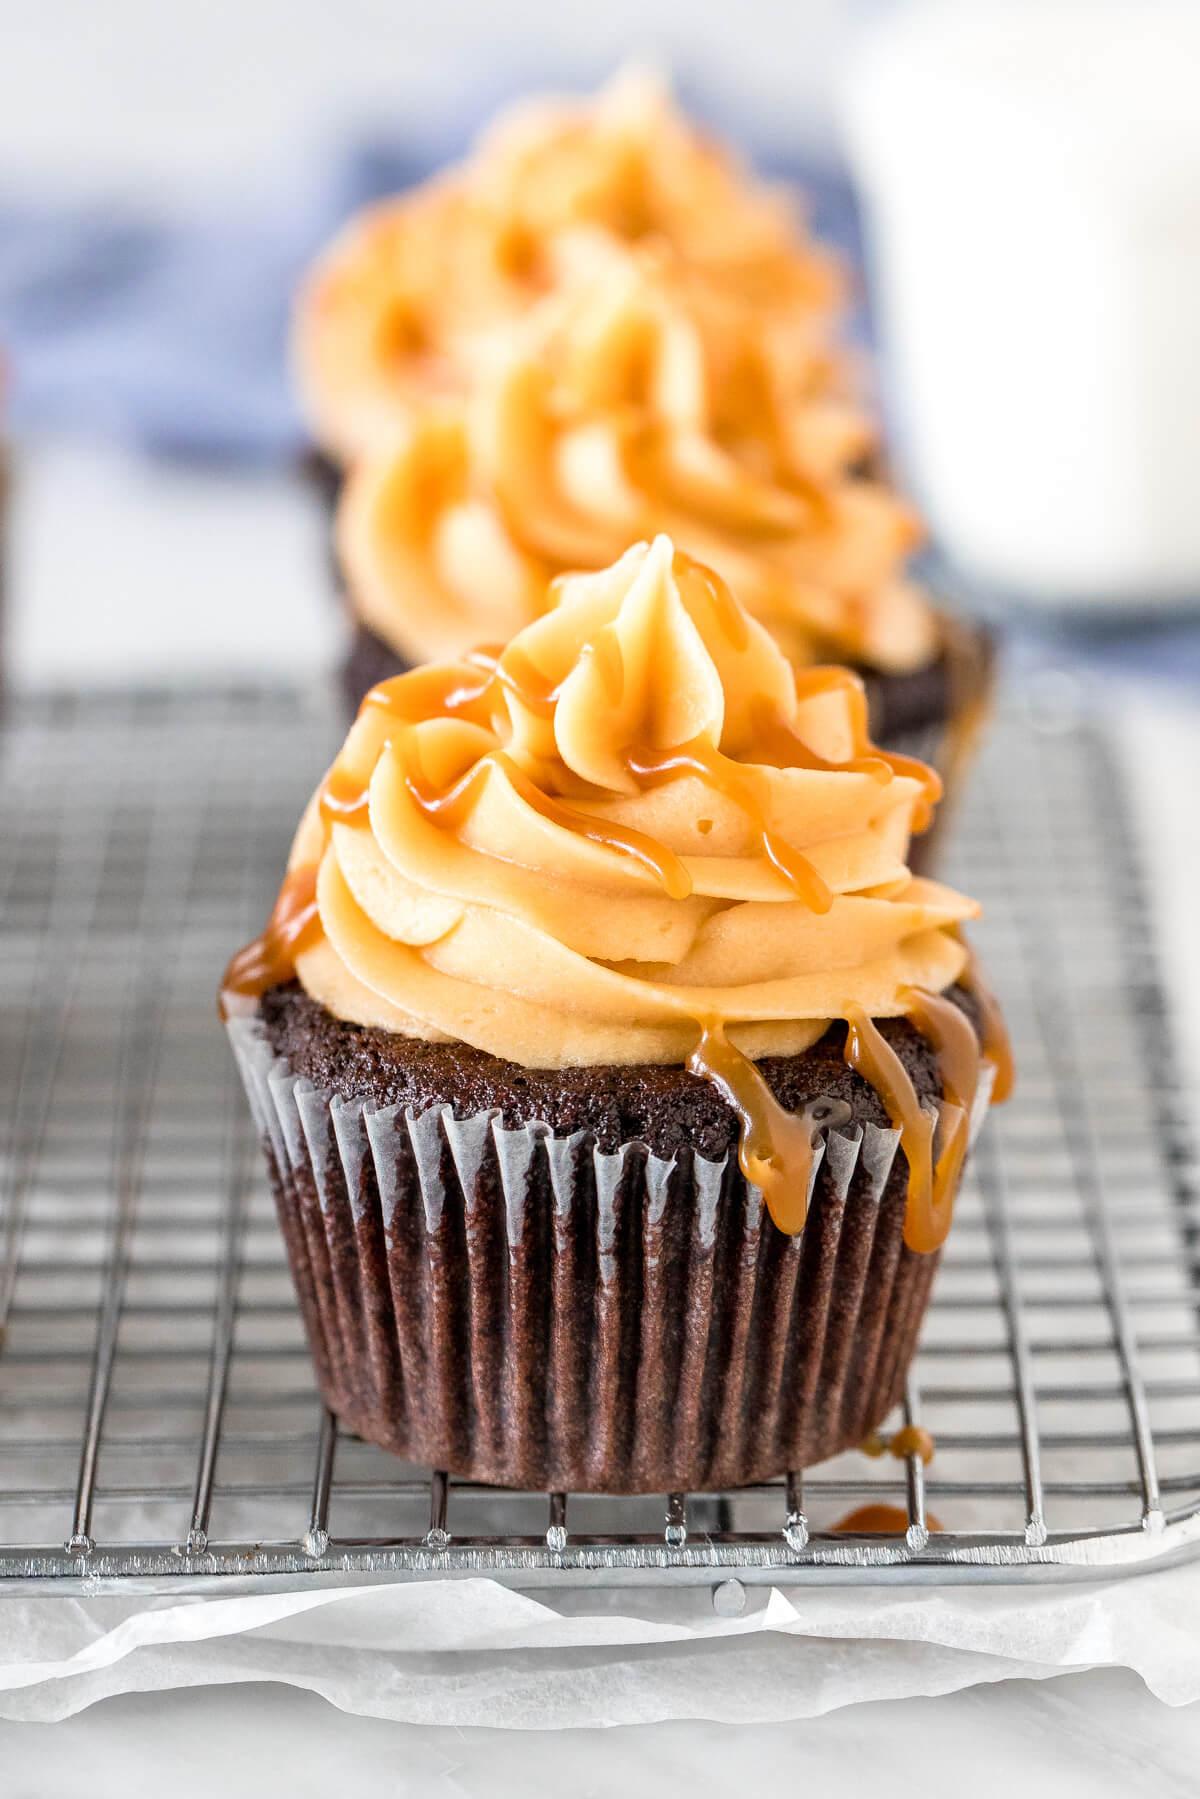 Chocolate cupcakes with caramel frosting and caramel sauce.